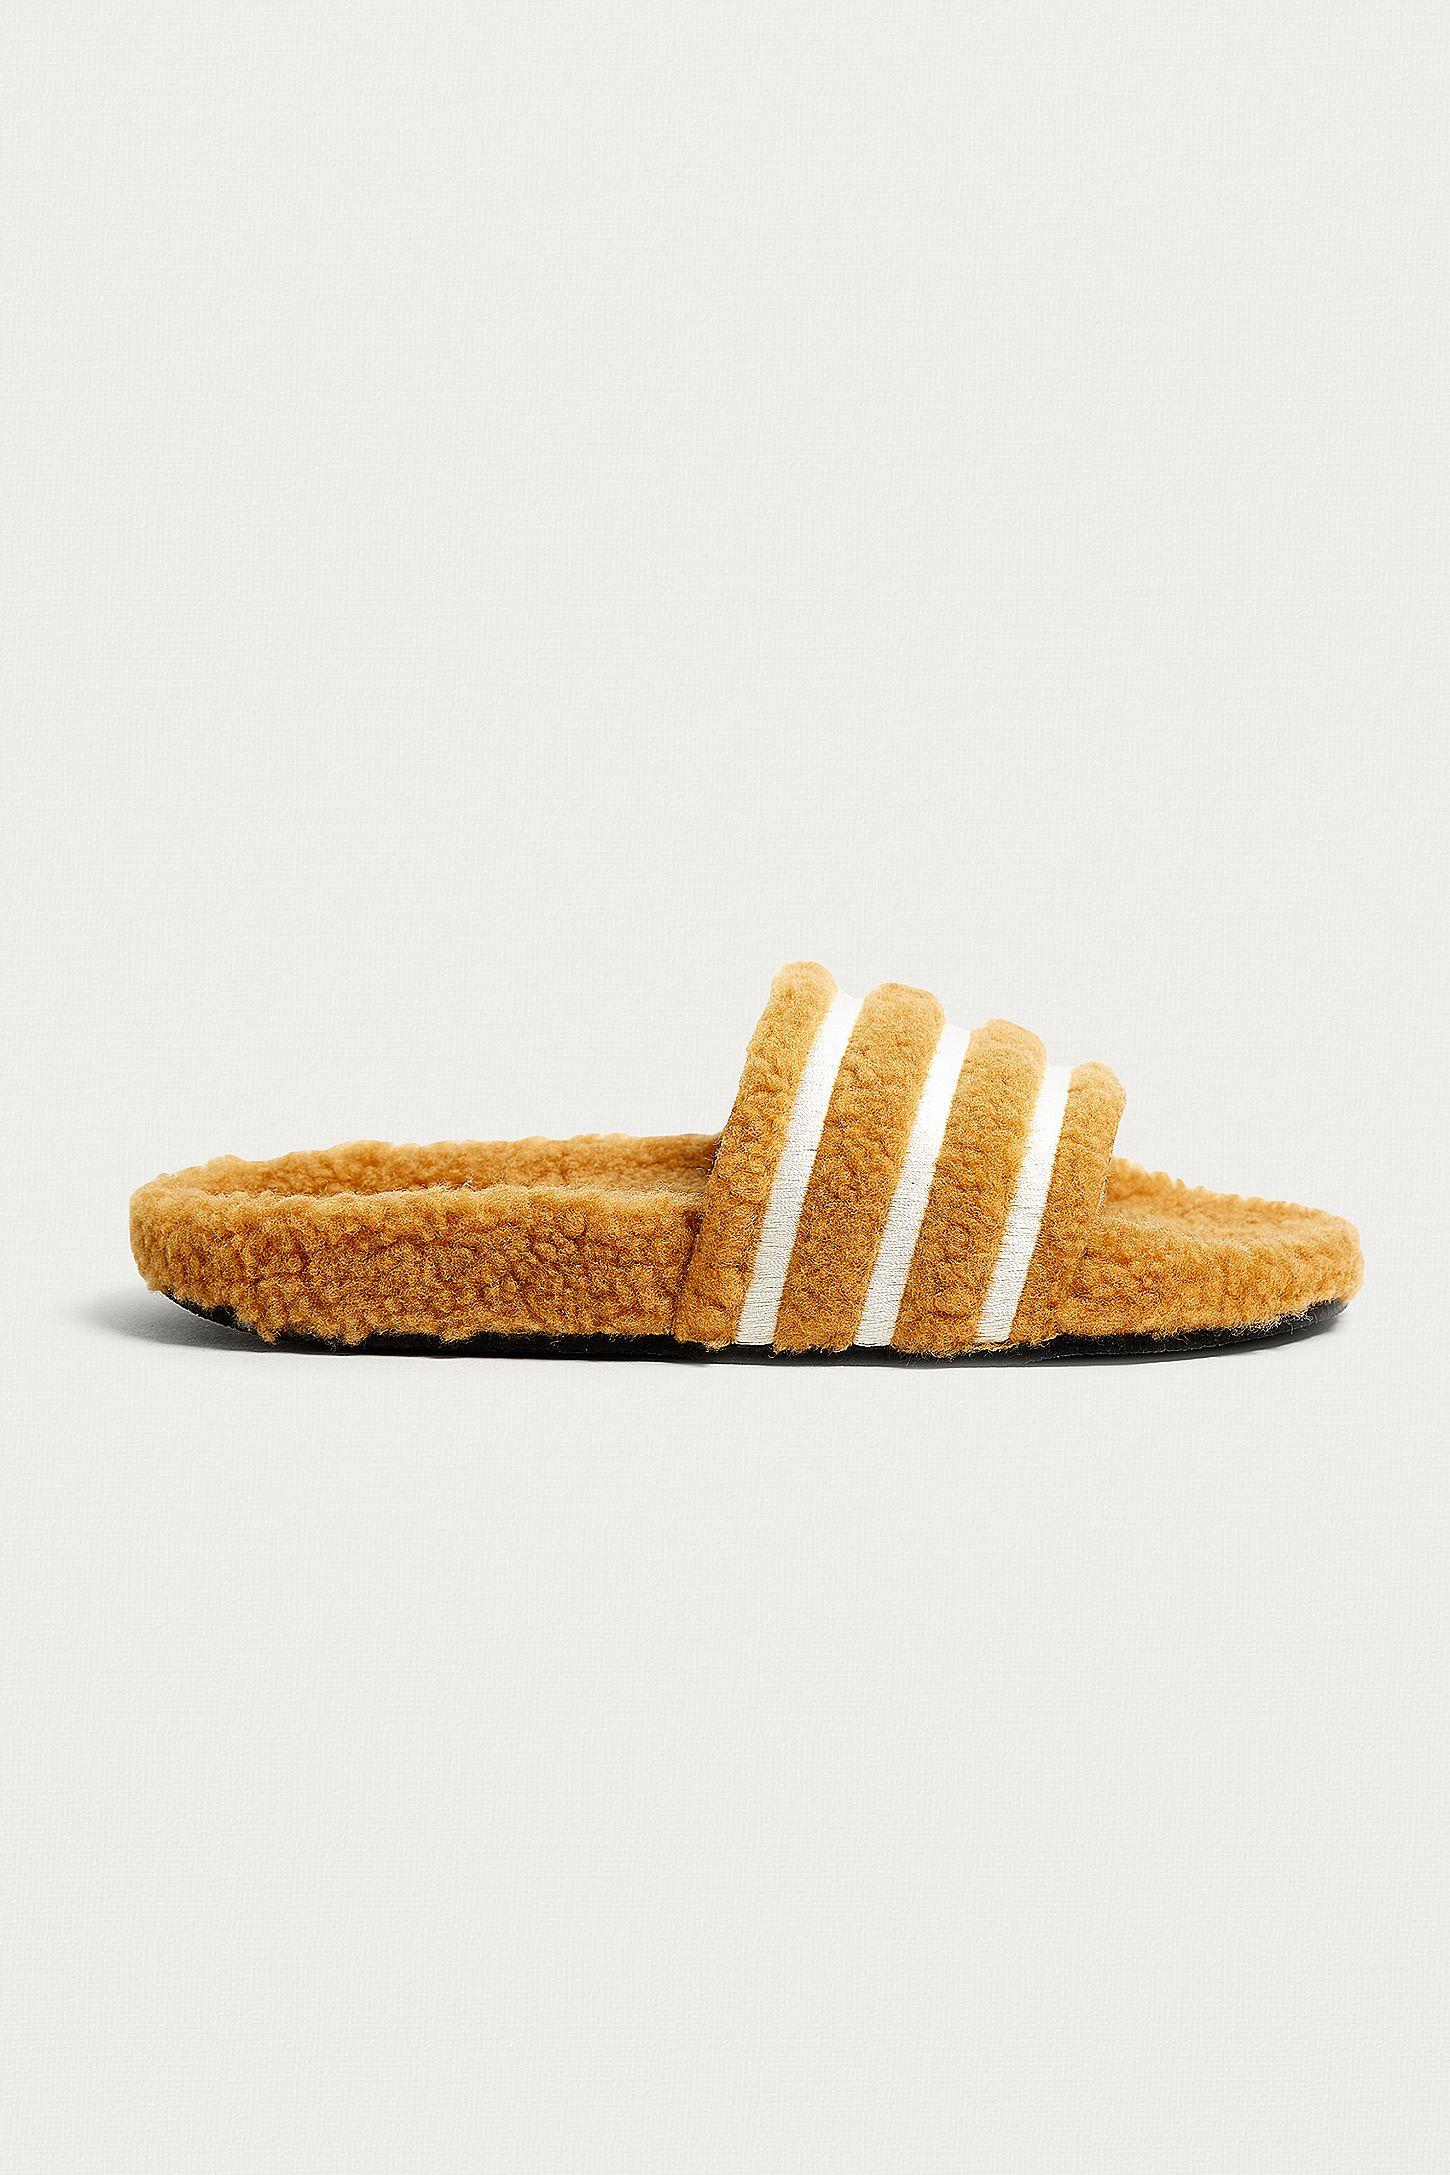 95c51d9874ac adidas Originals Adilette Brown Striped Teddy Slides